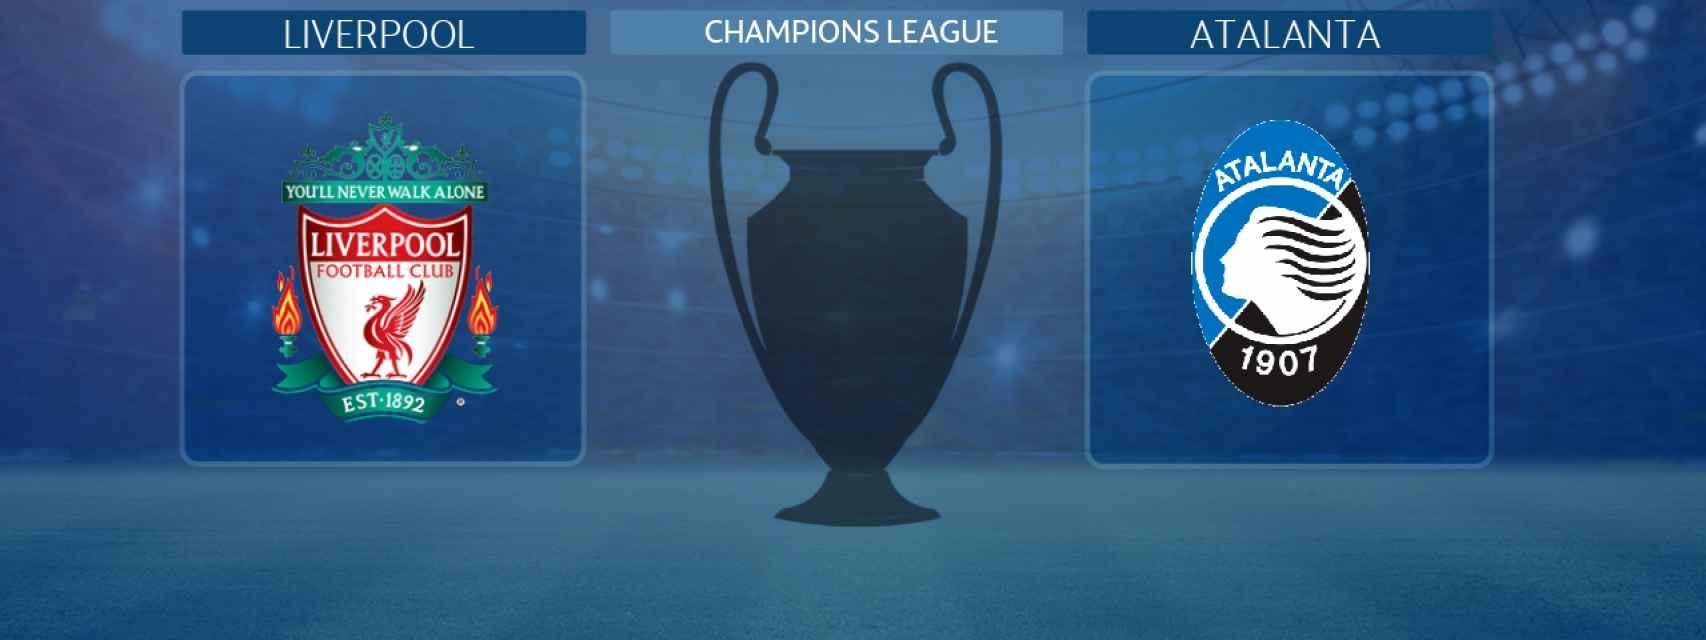 Liverpool - Atalanta, partido de la Champions League